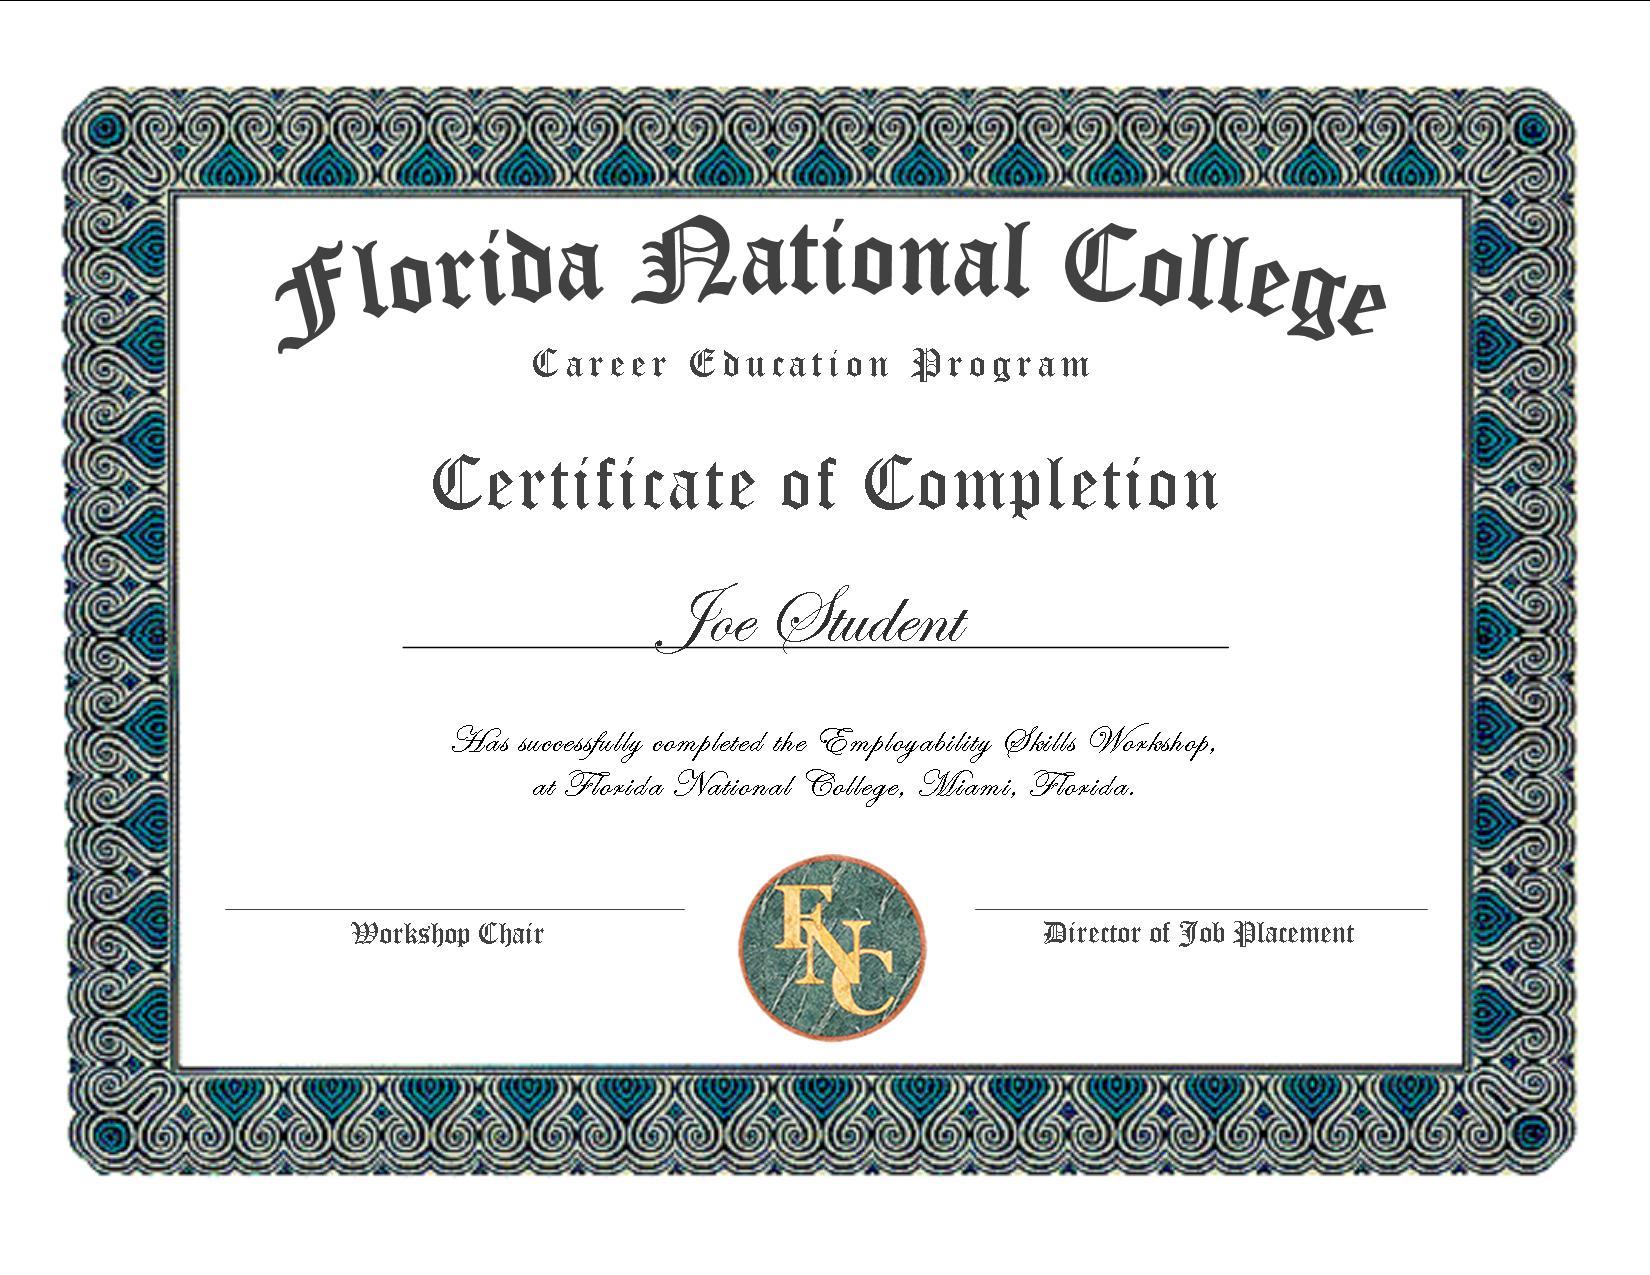 Career Education Program Certification